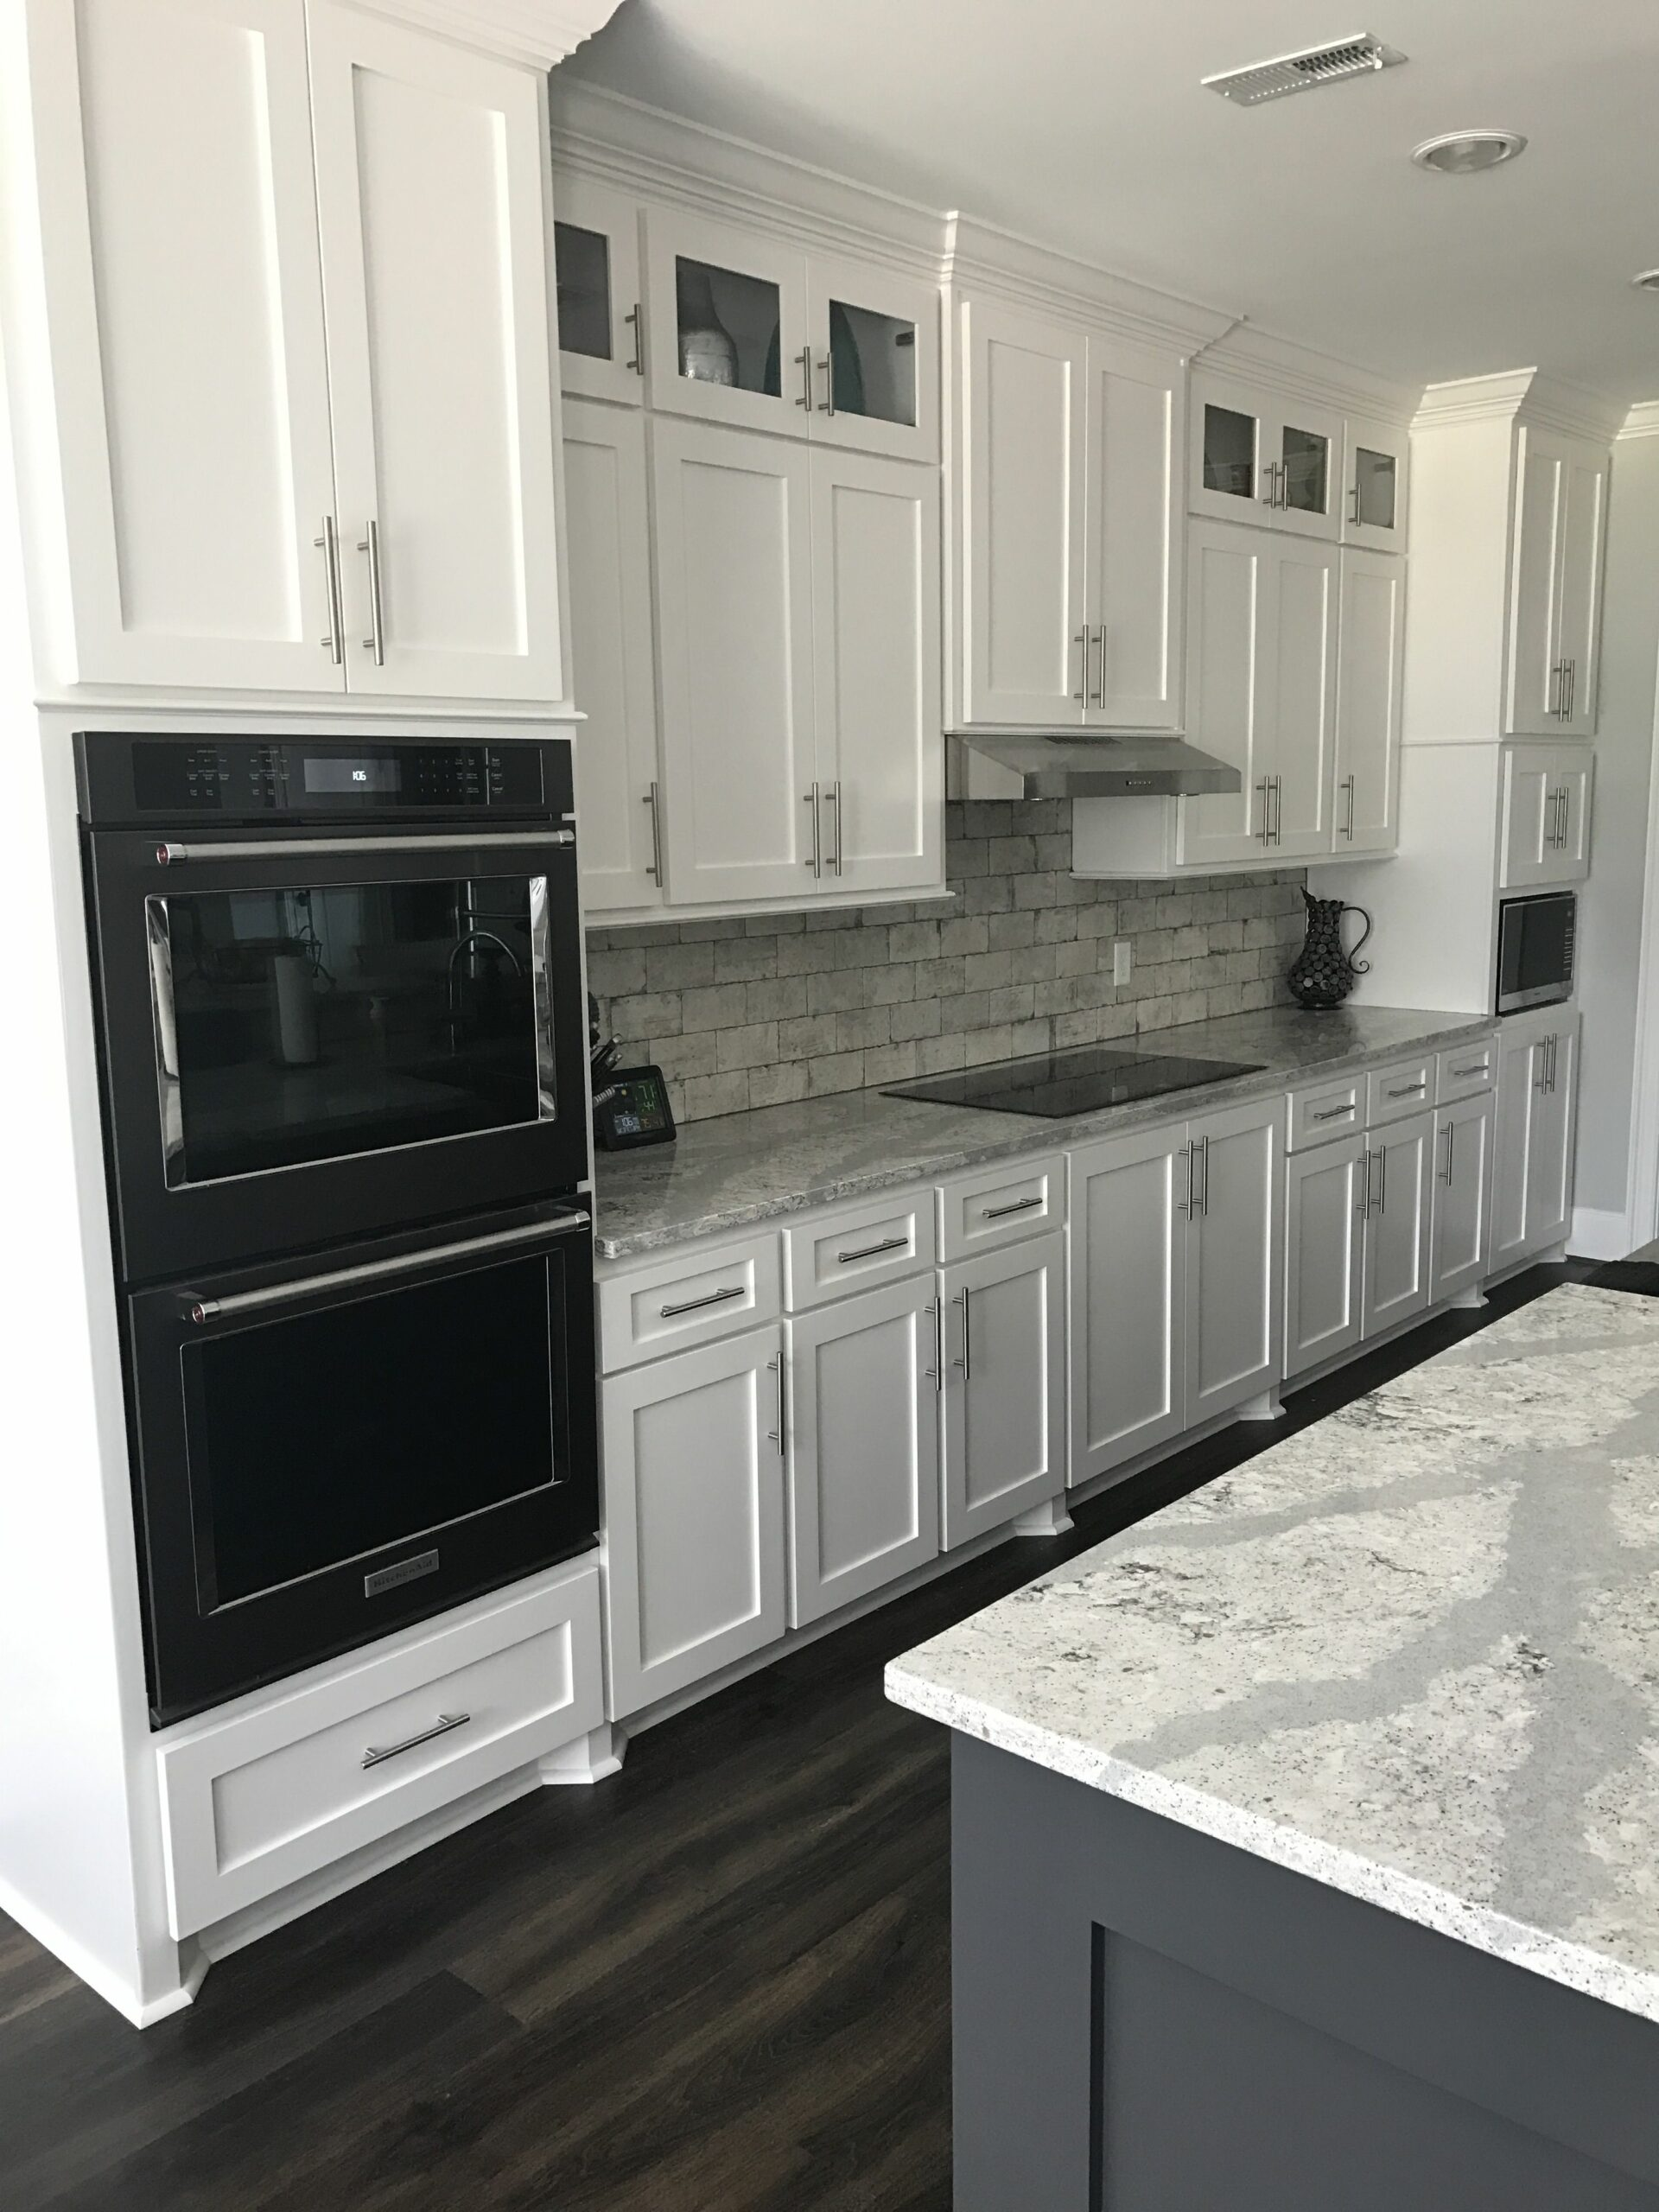 Modern Kitchen With Black Stainless Steel Appliances